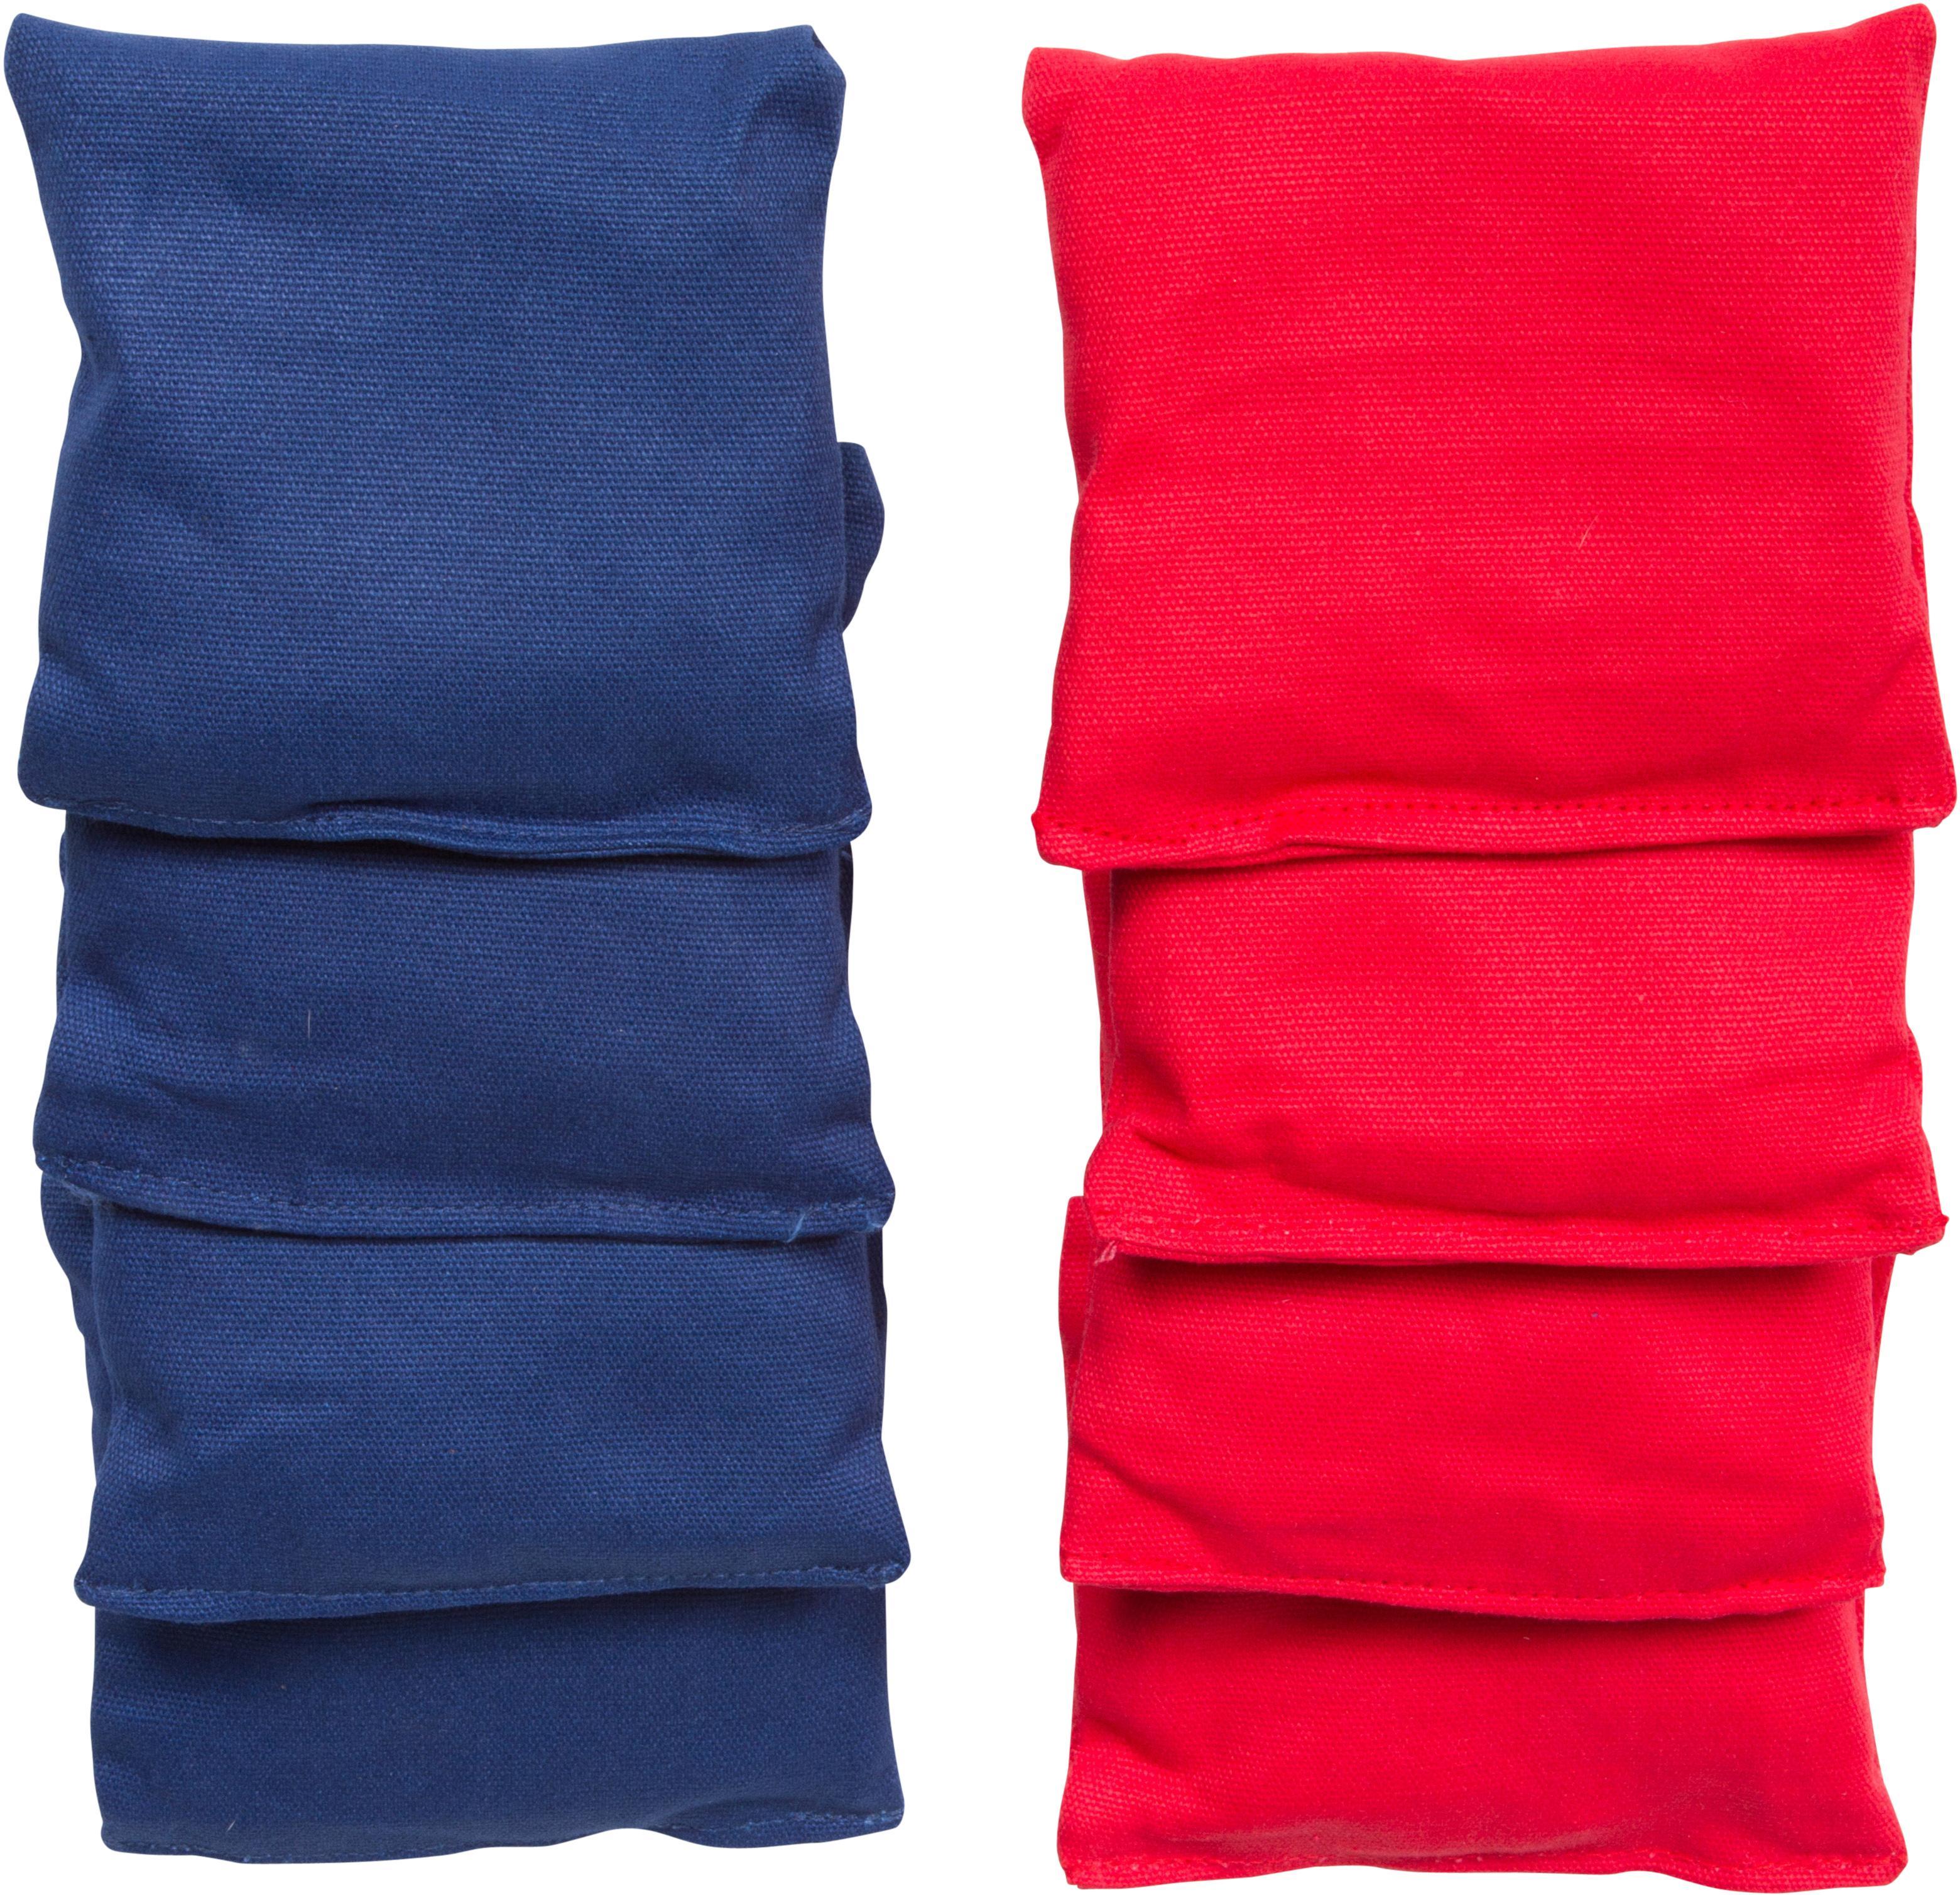 How to Make Cornhole Bags | Do-It-Yourself Advice Blog. |Corn Hole Bean Bags